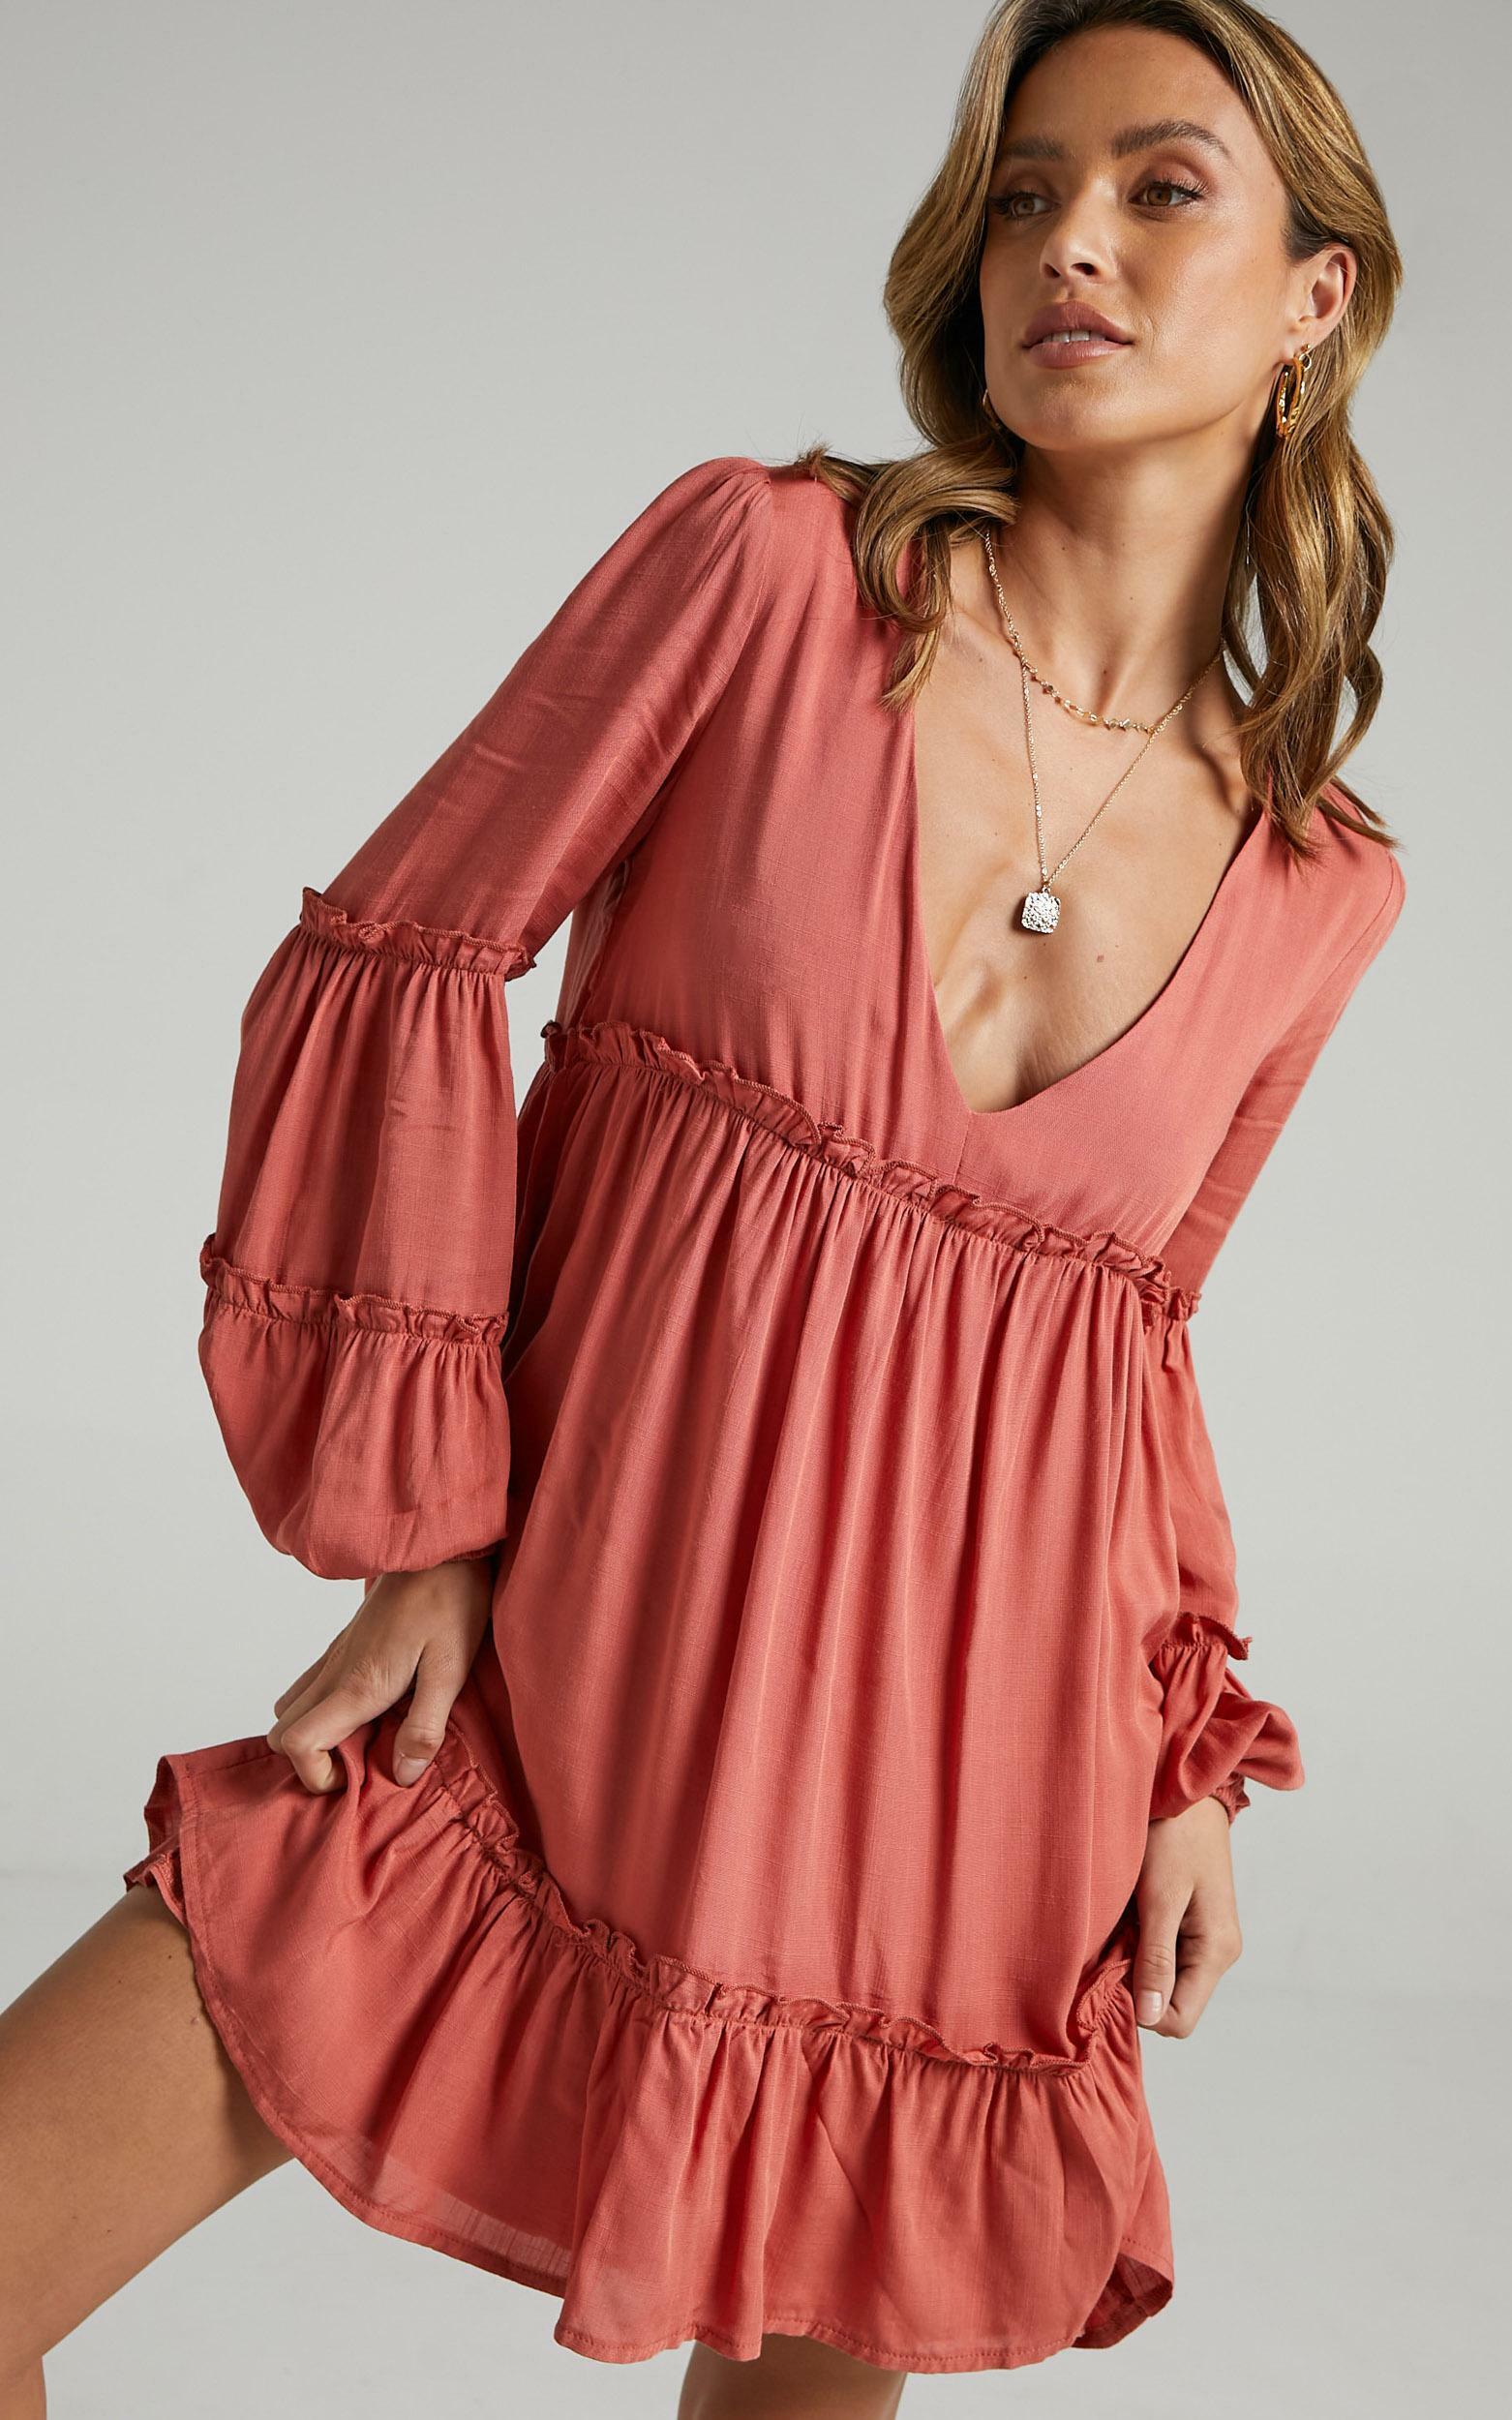 Summer Soul Dress in Rust - 04, BRN2, hi-res image number null